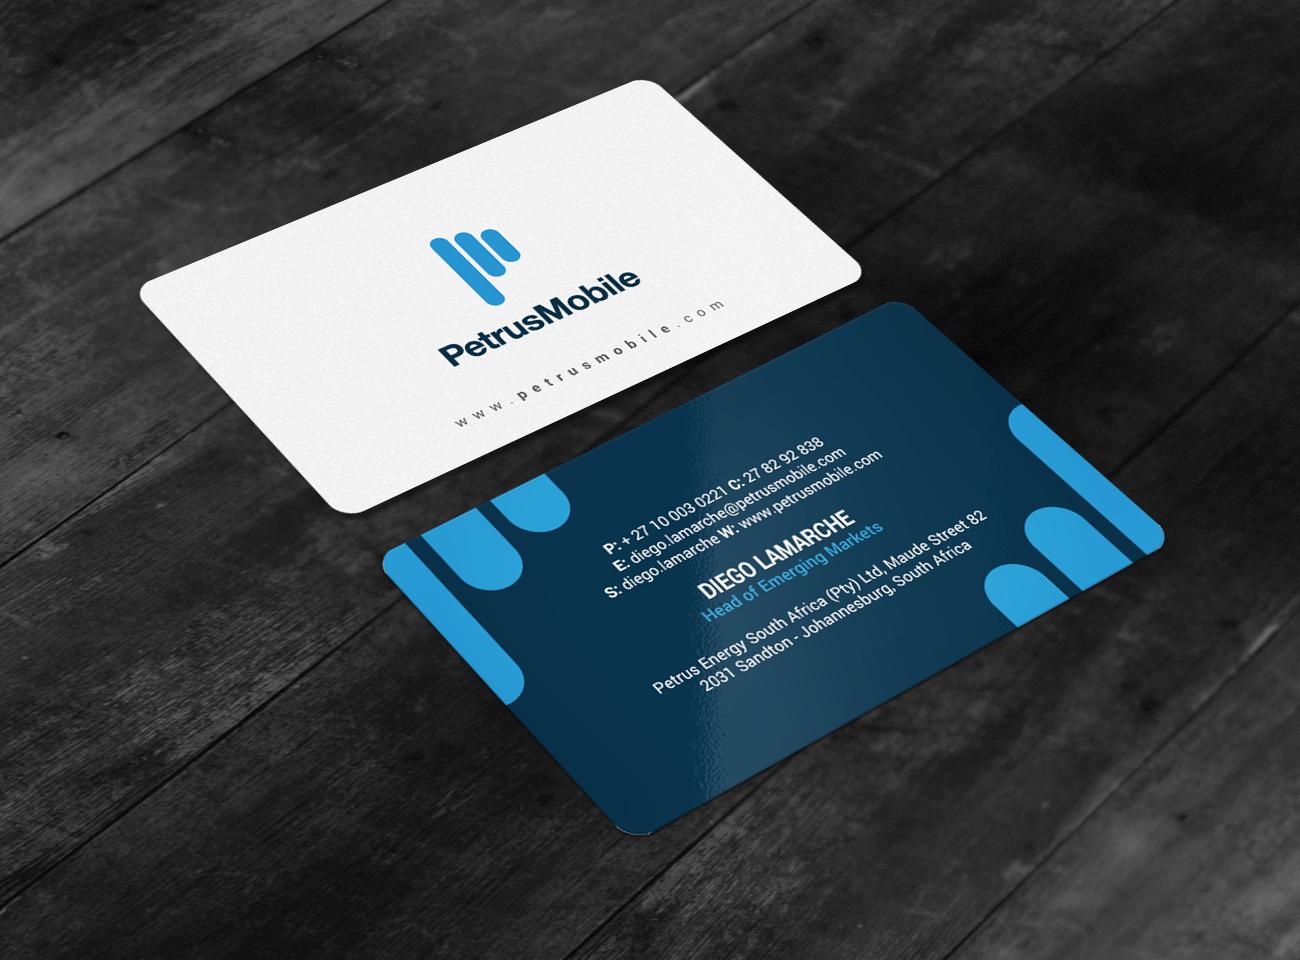 Elegant serious wireless communication business card design for business card design by chandrayaaneative for petrus sa design 16307334 colourmoves